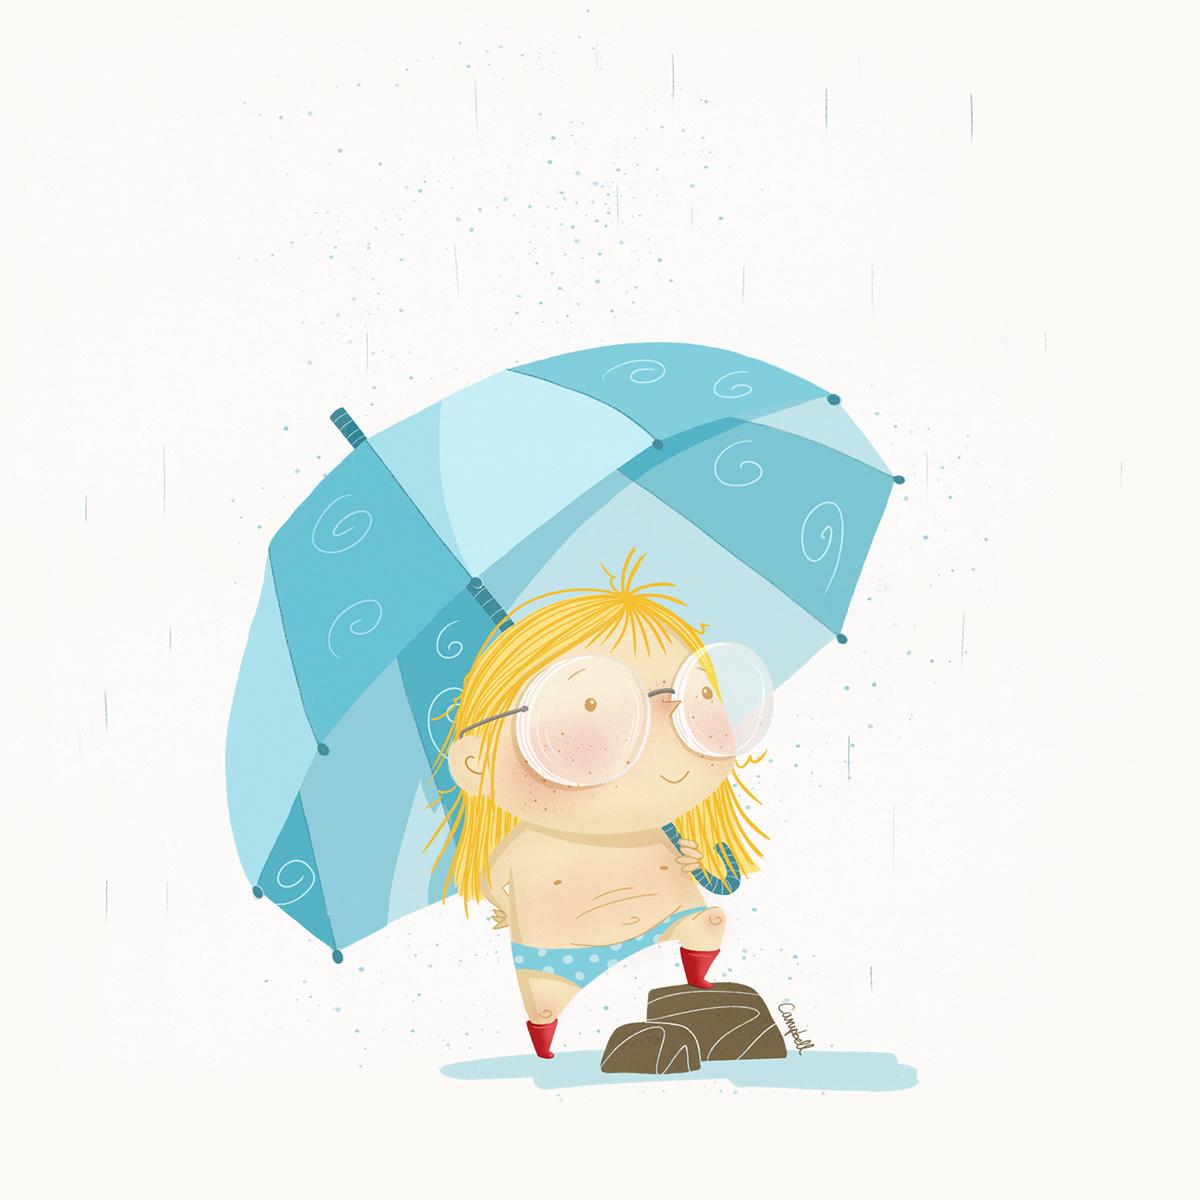 Image may contain: cartoon, umbrella and accessory